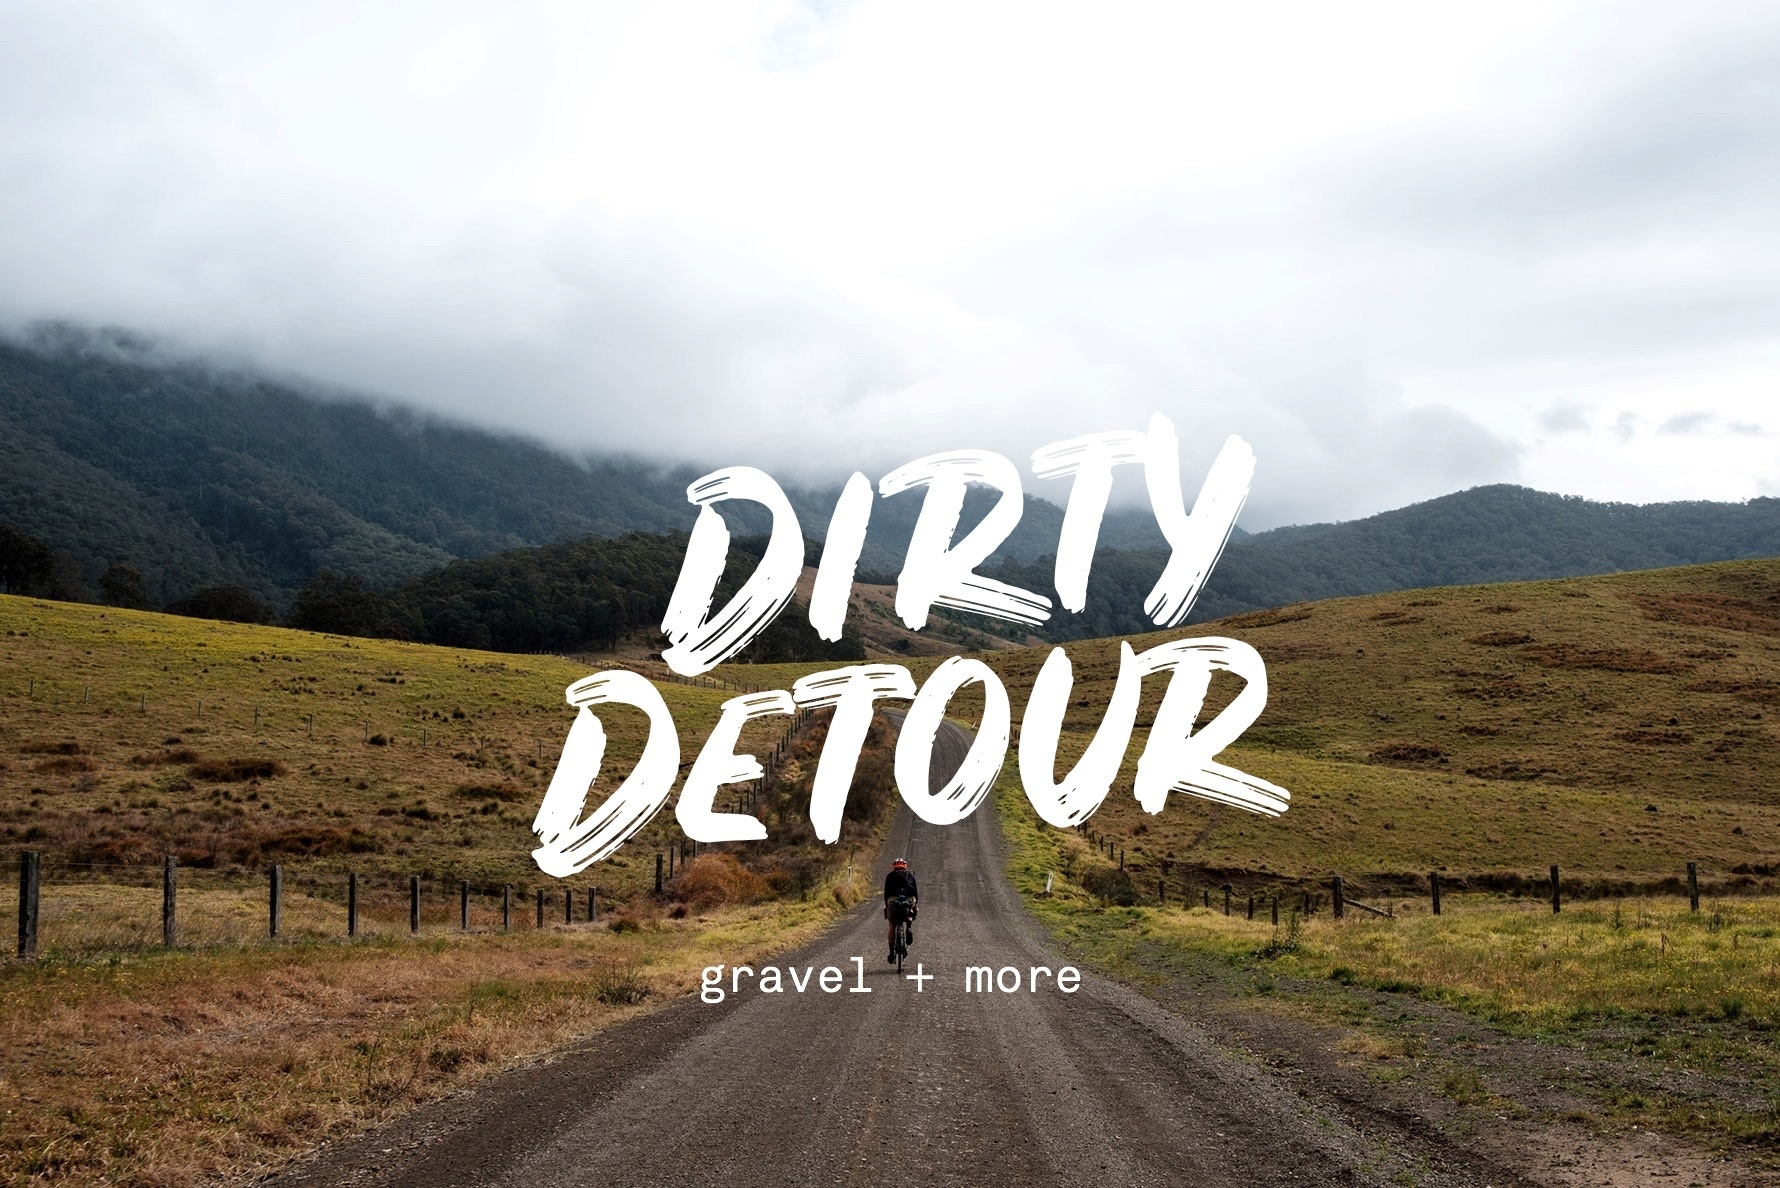 Dirty Detour Australian gravel race photo and logo